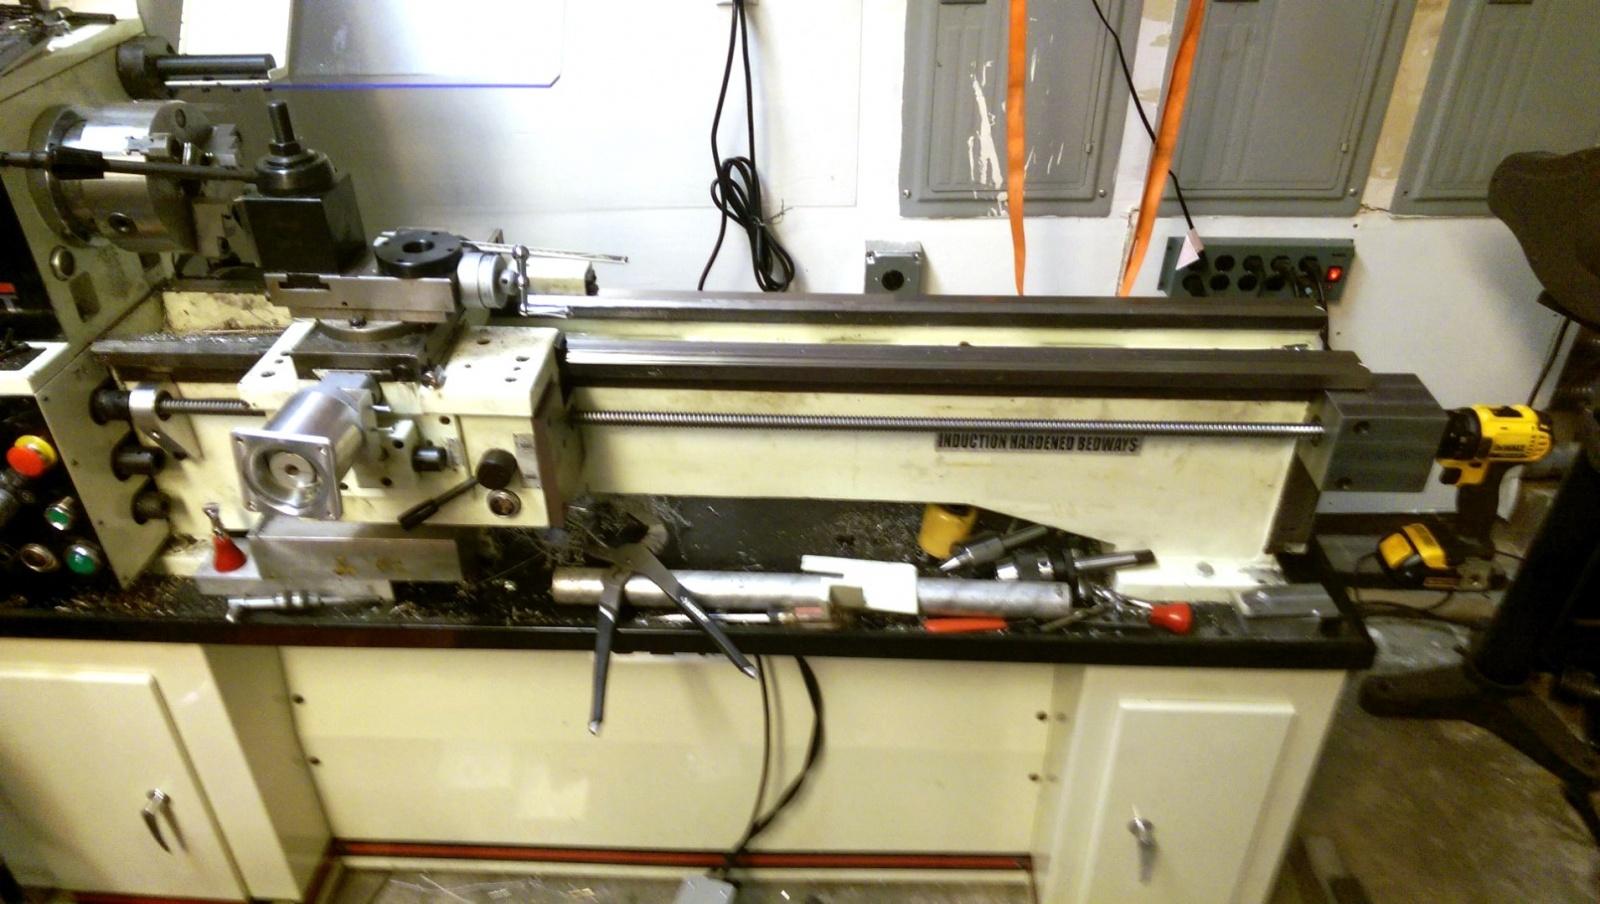 Модернизация токарного станка под работу с ЧПУ - 18